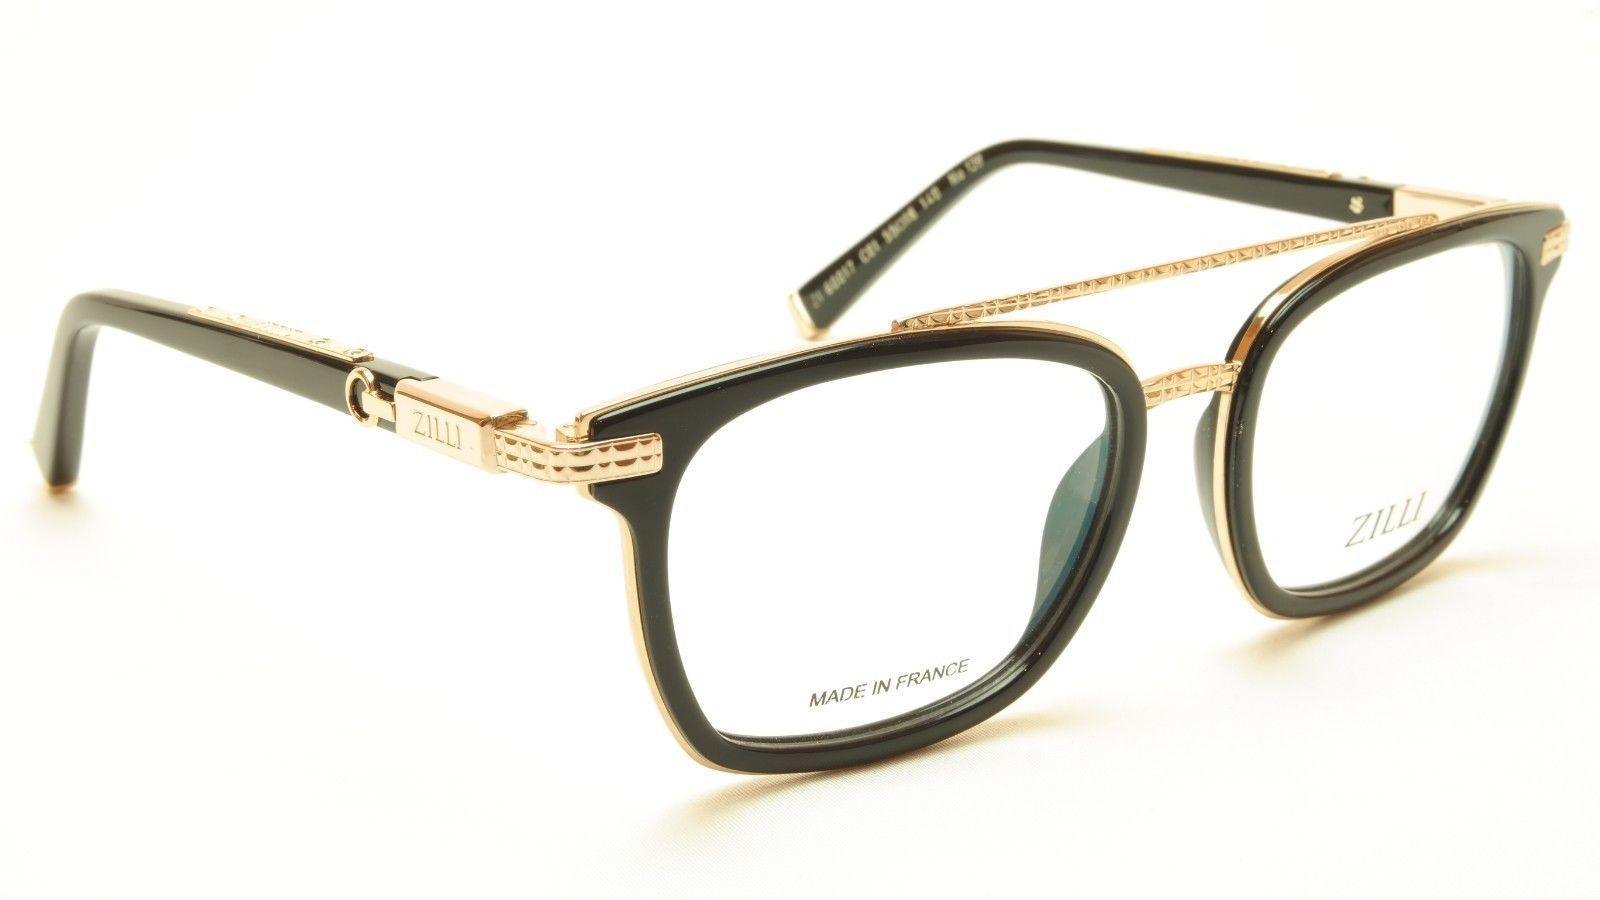 cc131cb6e30 ZILLI Eyeglasses Frame Acetate Titanium Black Gold France Hand Made ZI  60017 C01